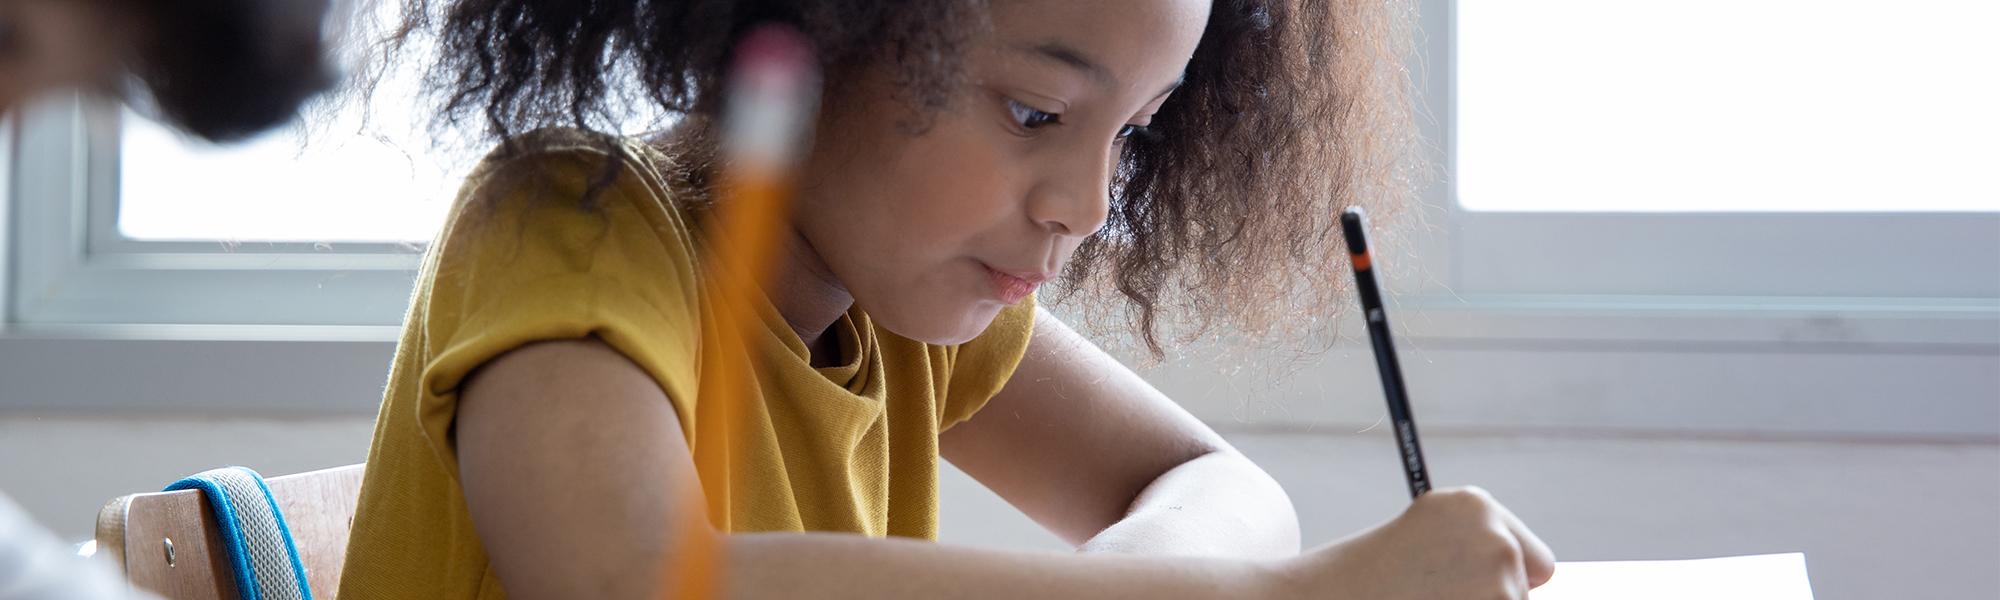 Georgia Risks Losing Billions in Federal Funds for Public Schools